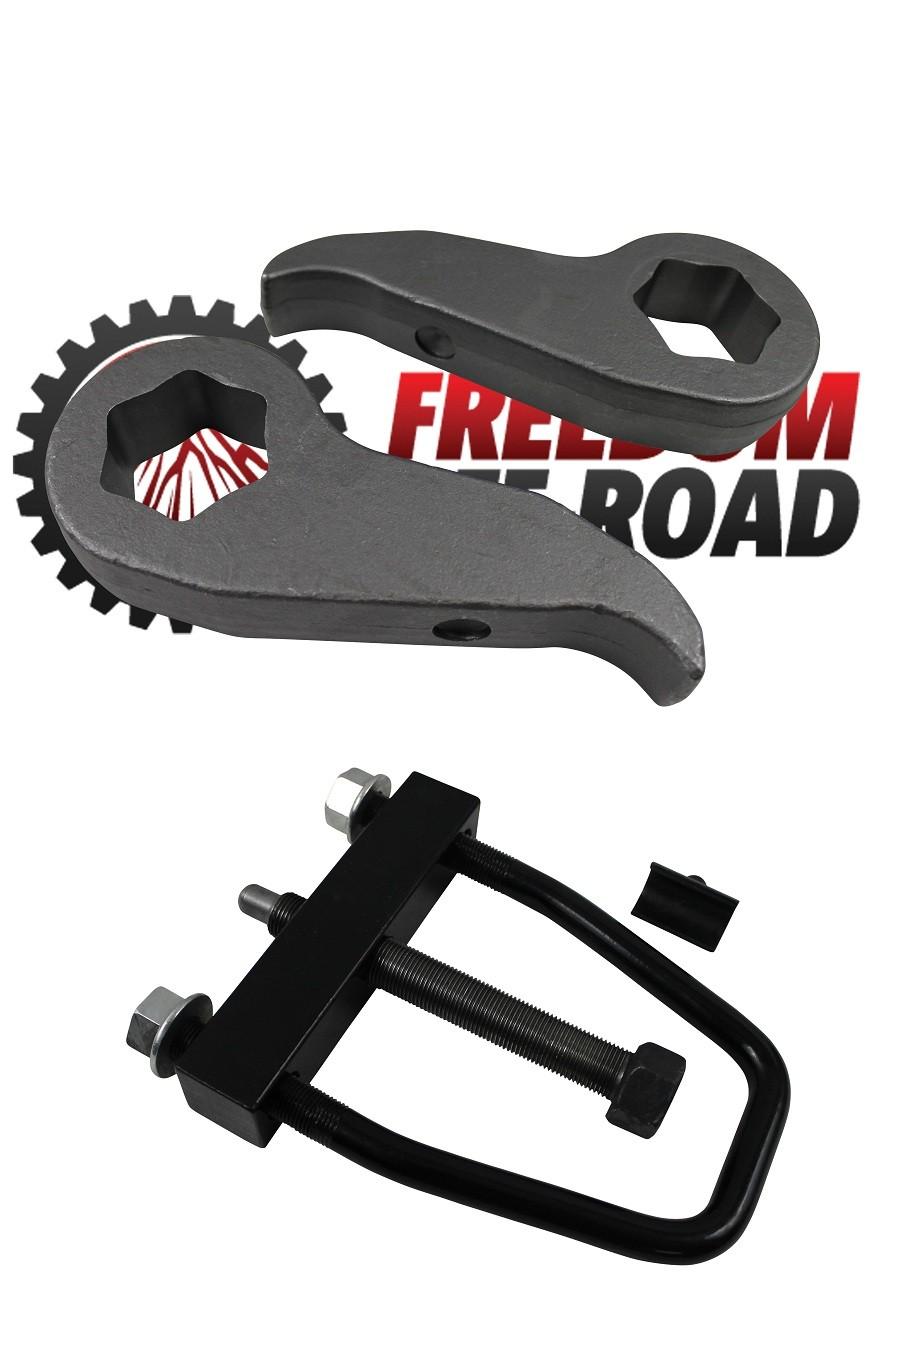 Install Tool Freedom Offroad 2000-2010 CHEVY GMC 2500 3500 HD Torsion Keys Shock Extenders